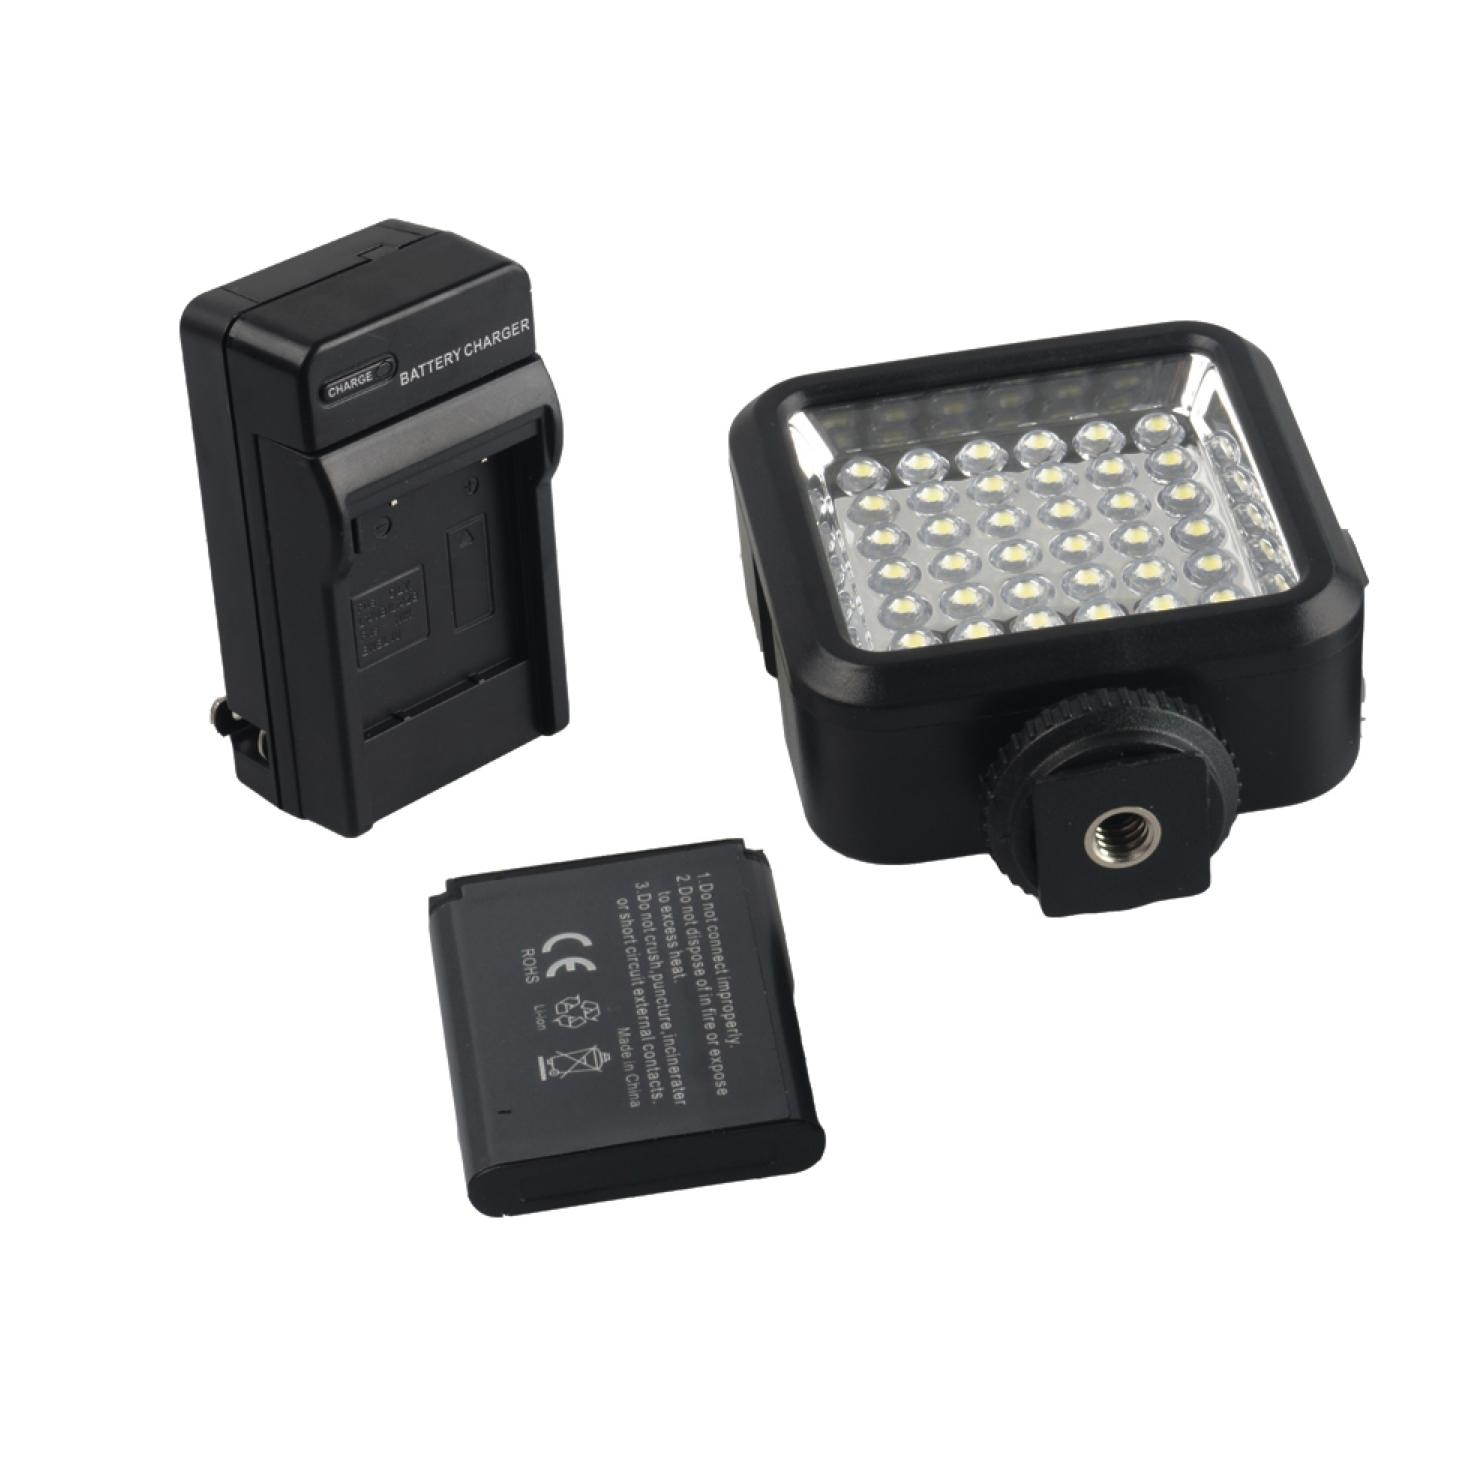 36 LED Video Light White Bright Lamp